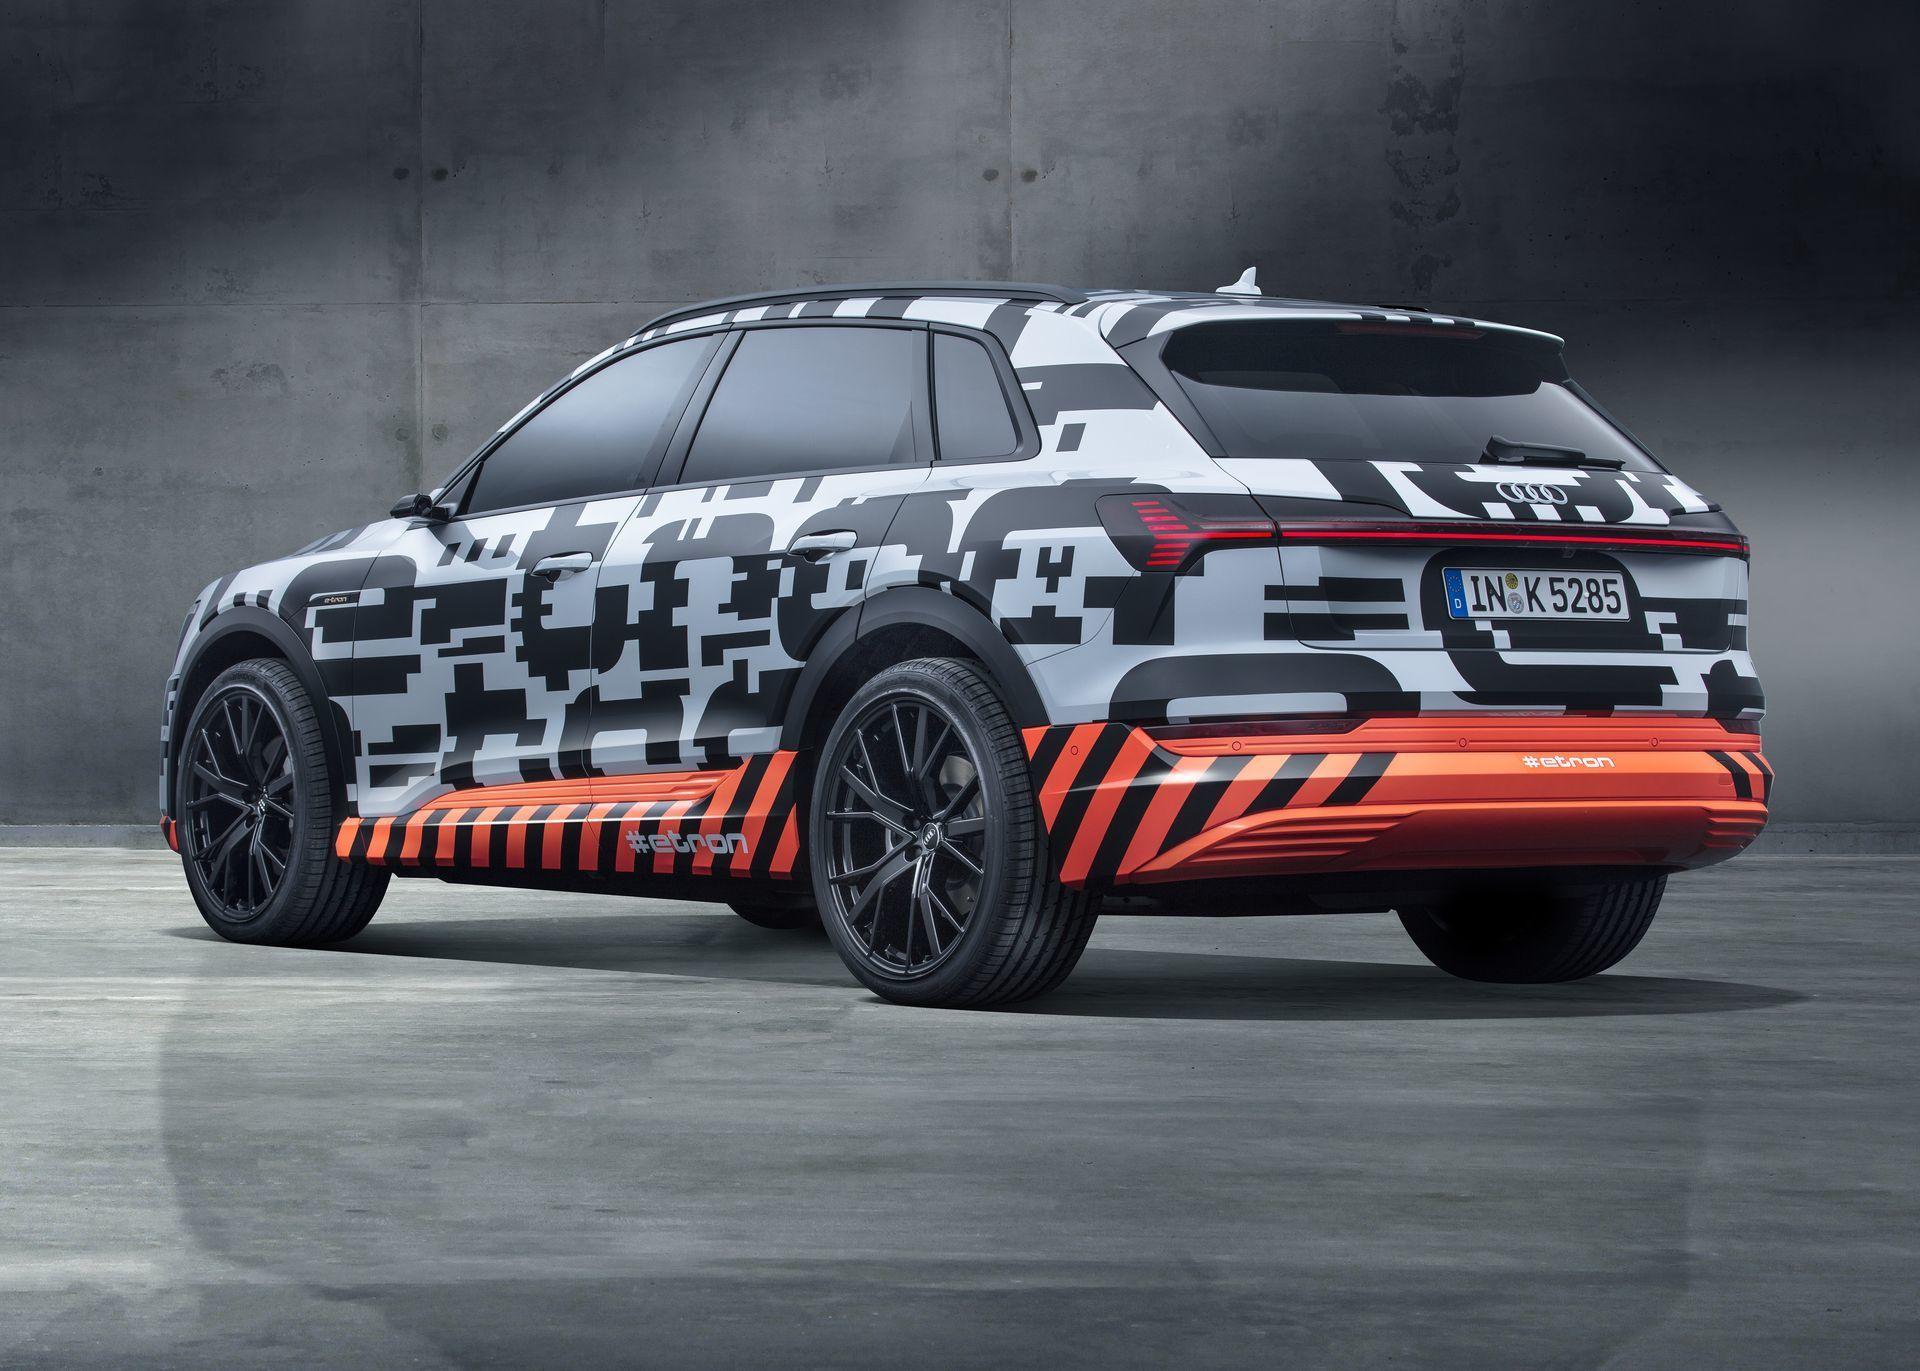 Descargar fondos de pantalla Audi e tron Sportback 2018 4k concepto SUV vehculos eléctricos coches alemanes el Audi carros Pinterest